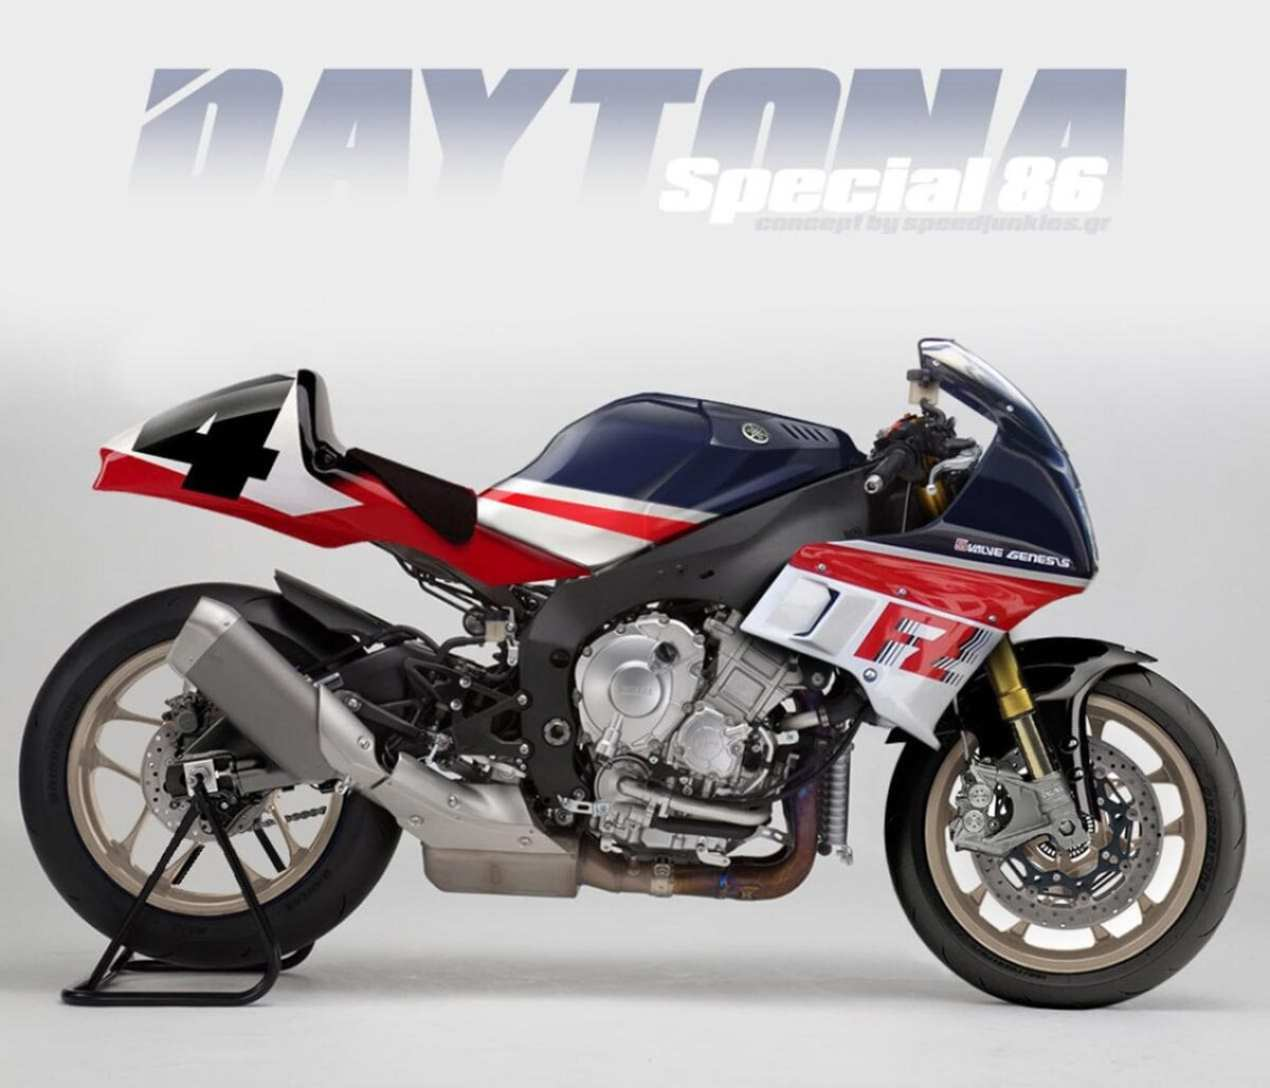 speedjunkies-yamaha-daytona-special-86